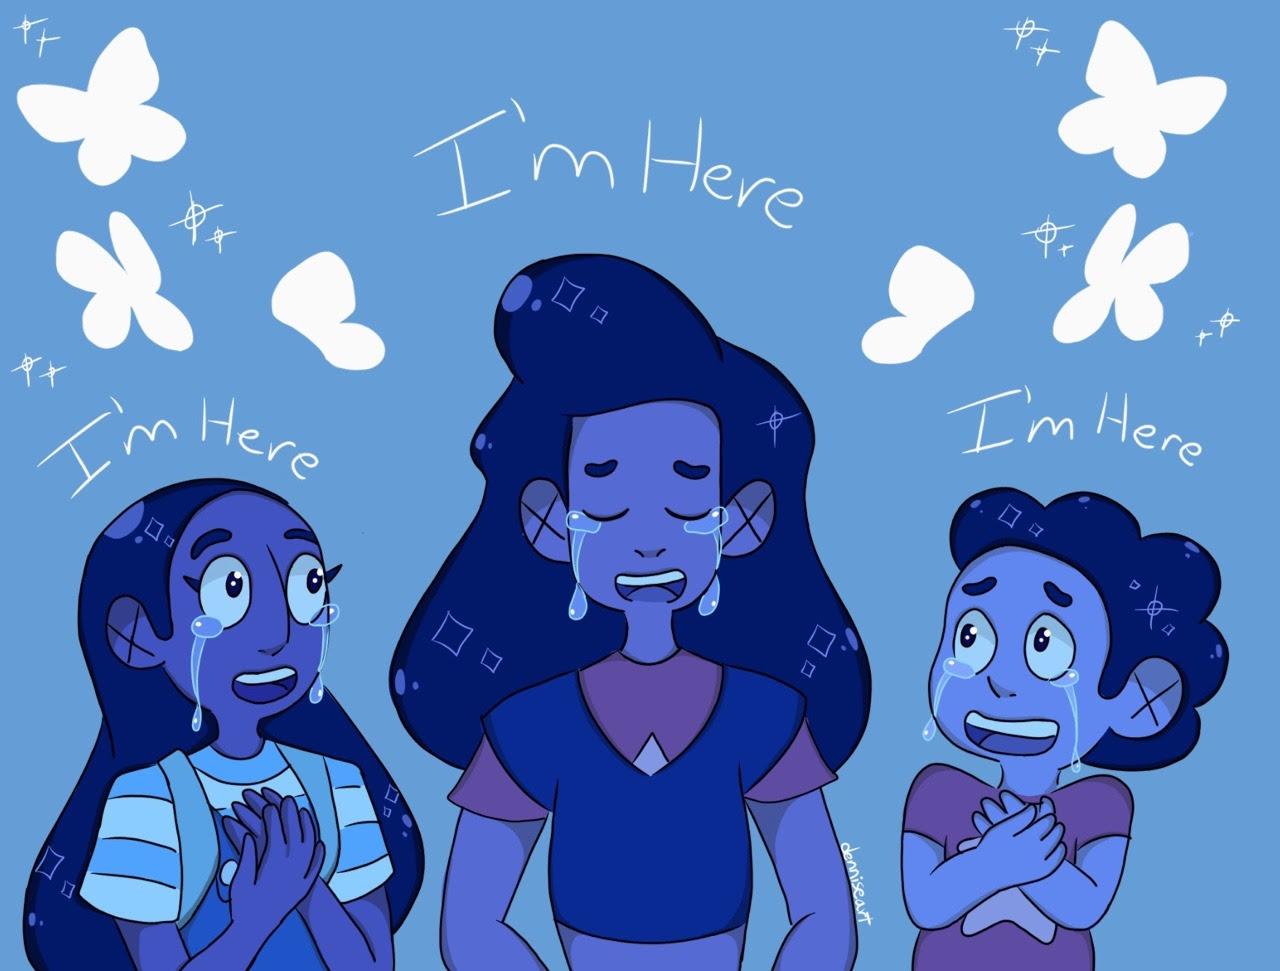 Esto yo lo dibuje hace tiempo pero es mi episodio favorito de Steven Universe 💜⭐️💙